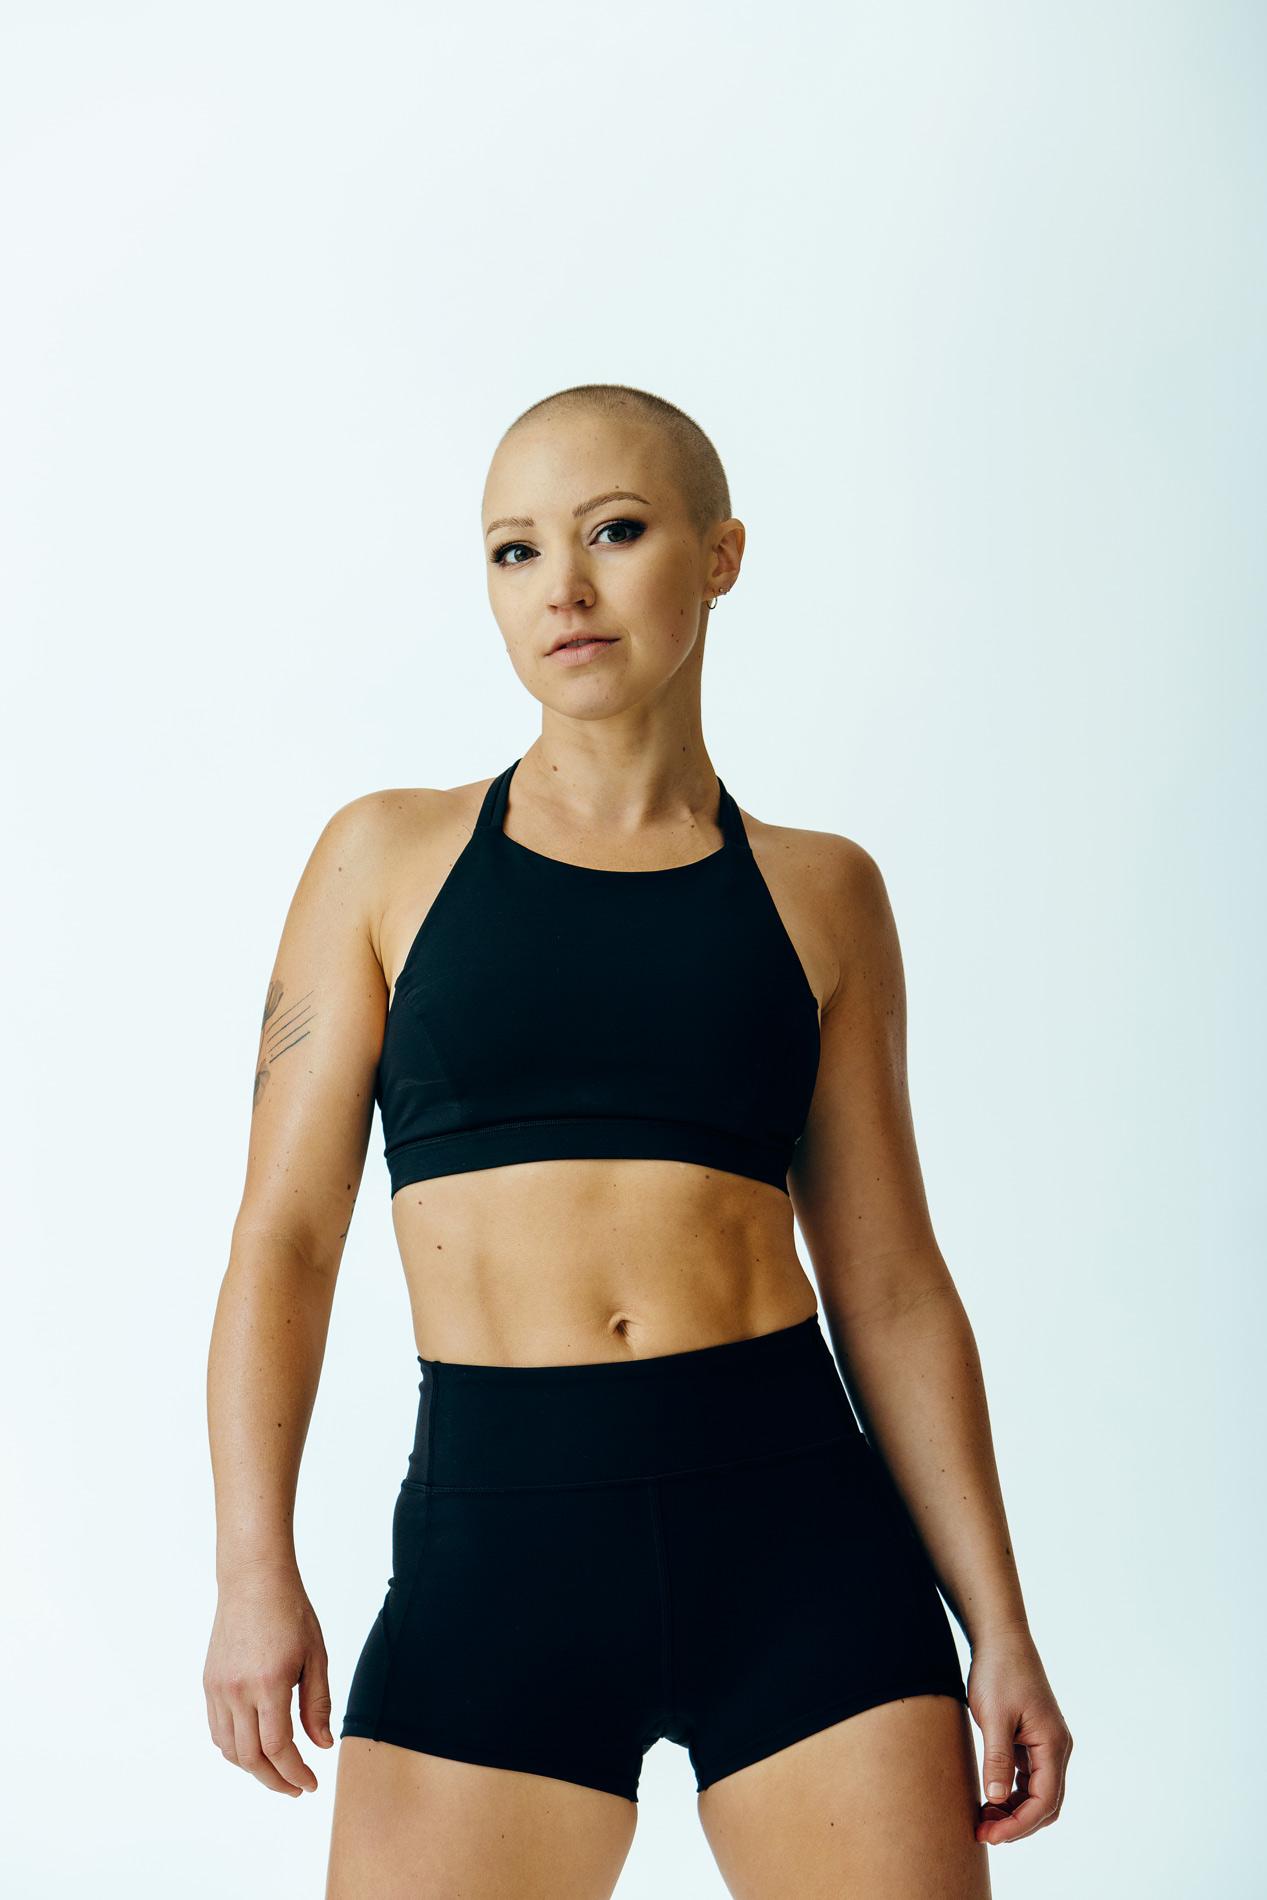 women_who_kick_cancer_ass_lianne_saffer_burn_cycle_by_gia_goodrich_12.jpg